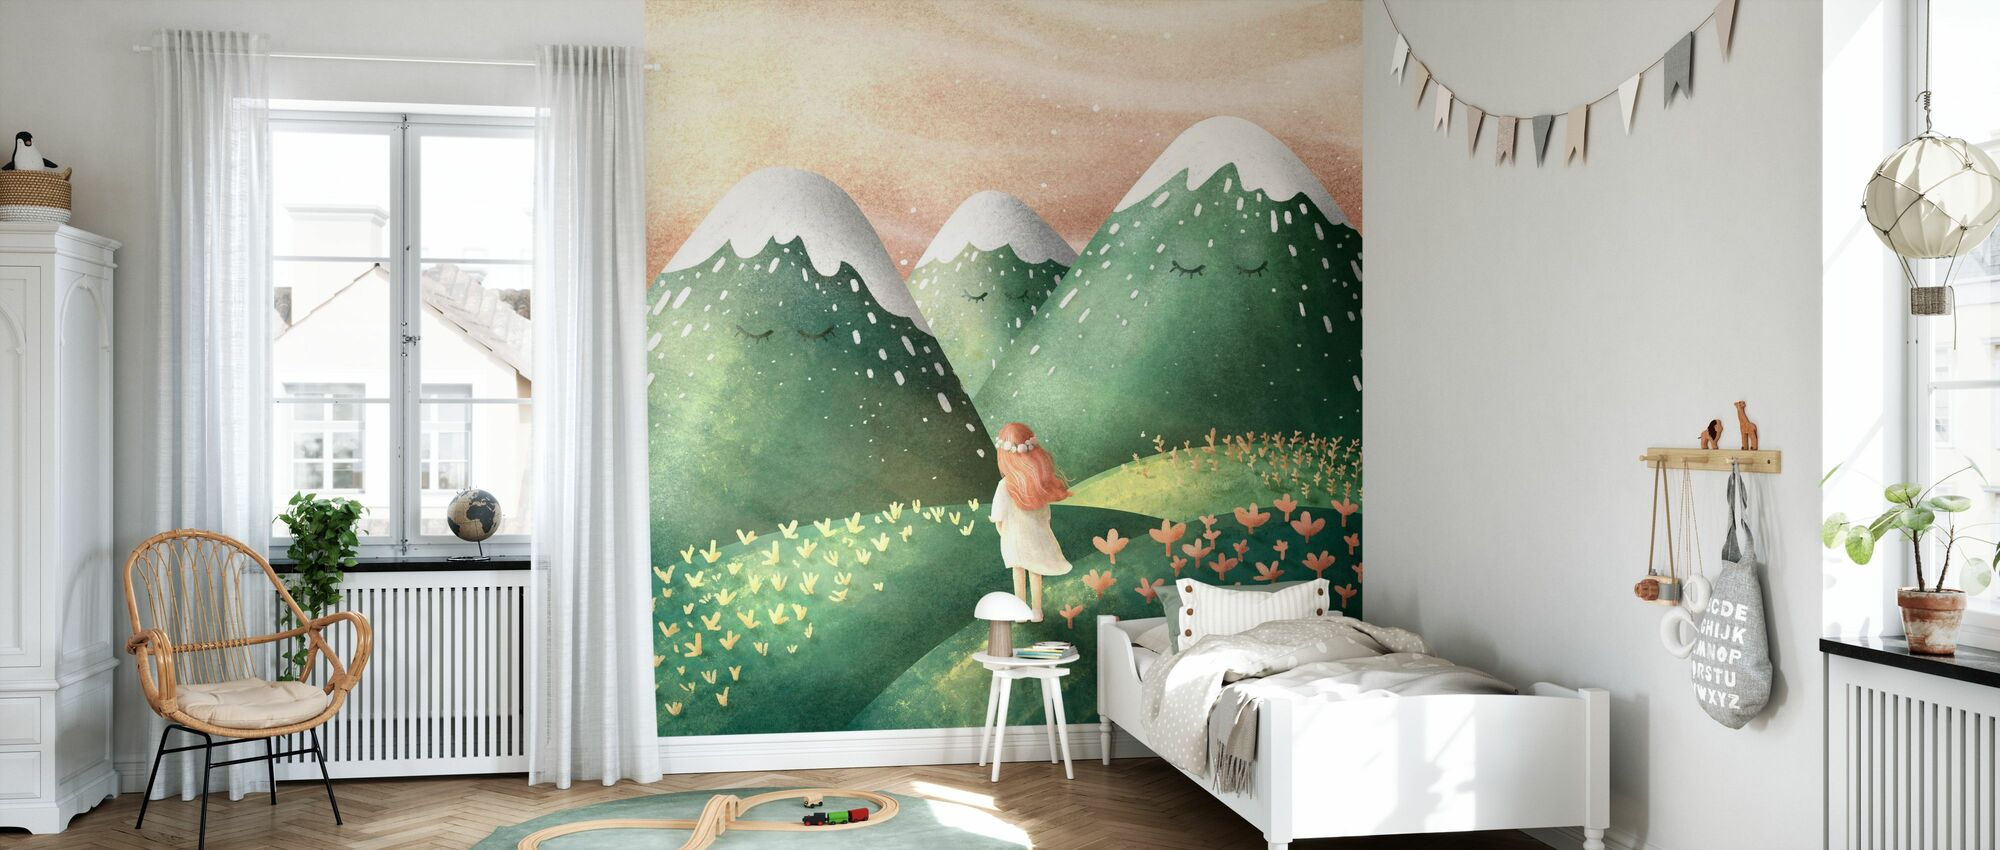 Dreamy - Hill - Wallpaper - Kids Room